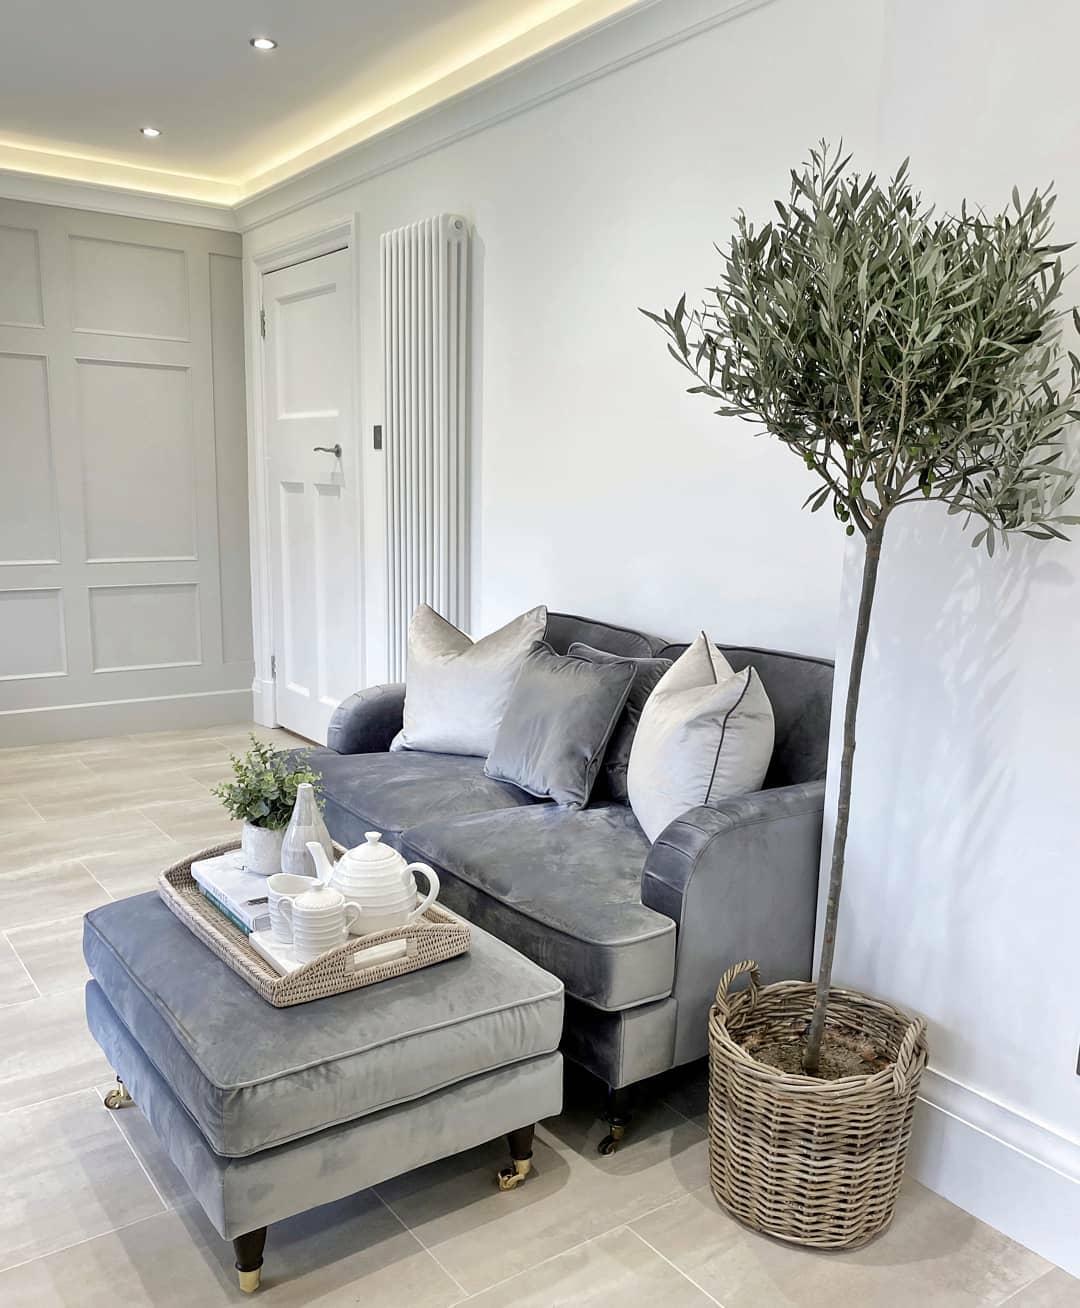 white vertical radiator behind a grey sofa